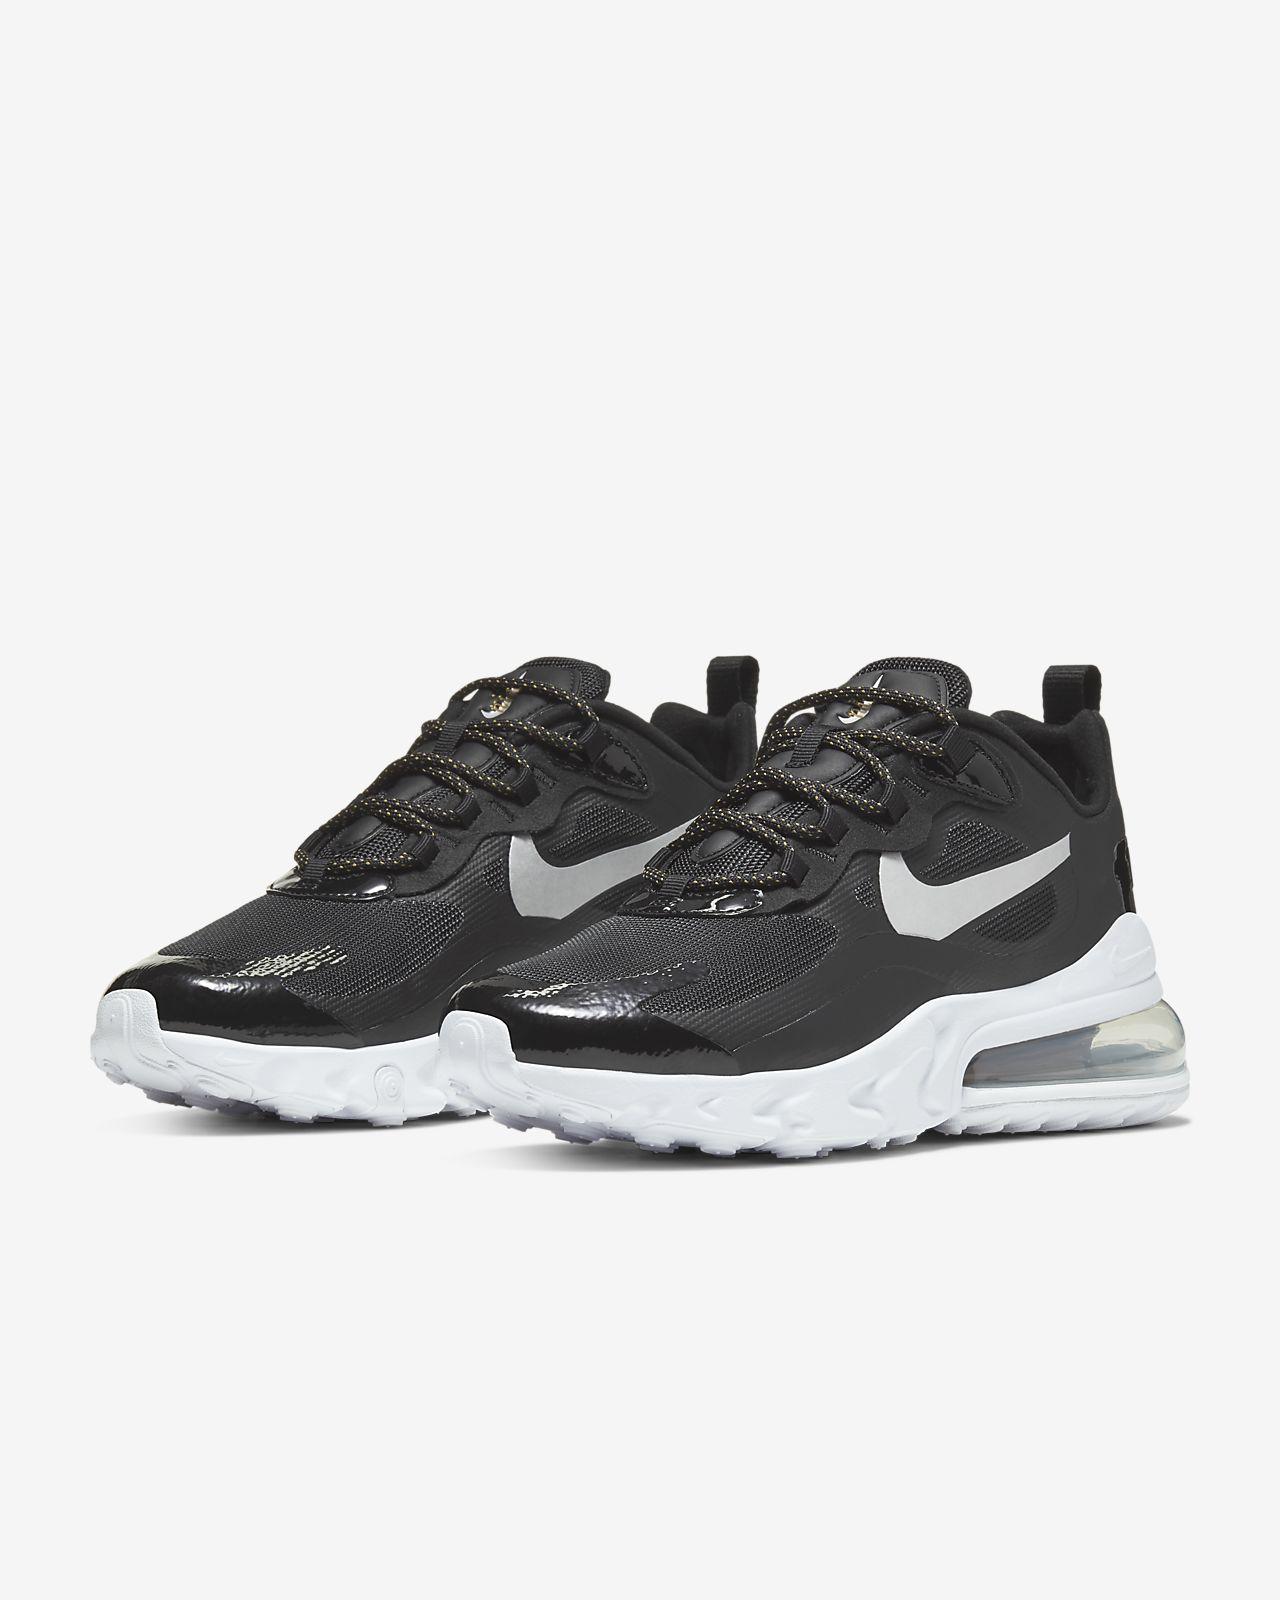 Nike Air Max 270 React (Optical), Sneakers Donna, Scarpe